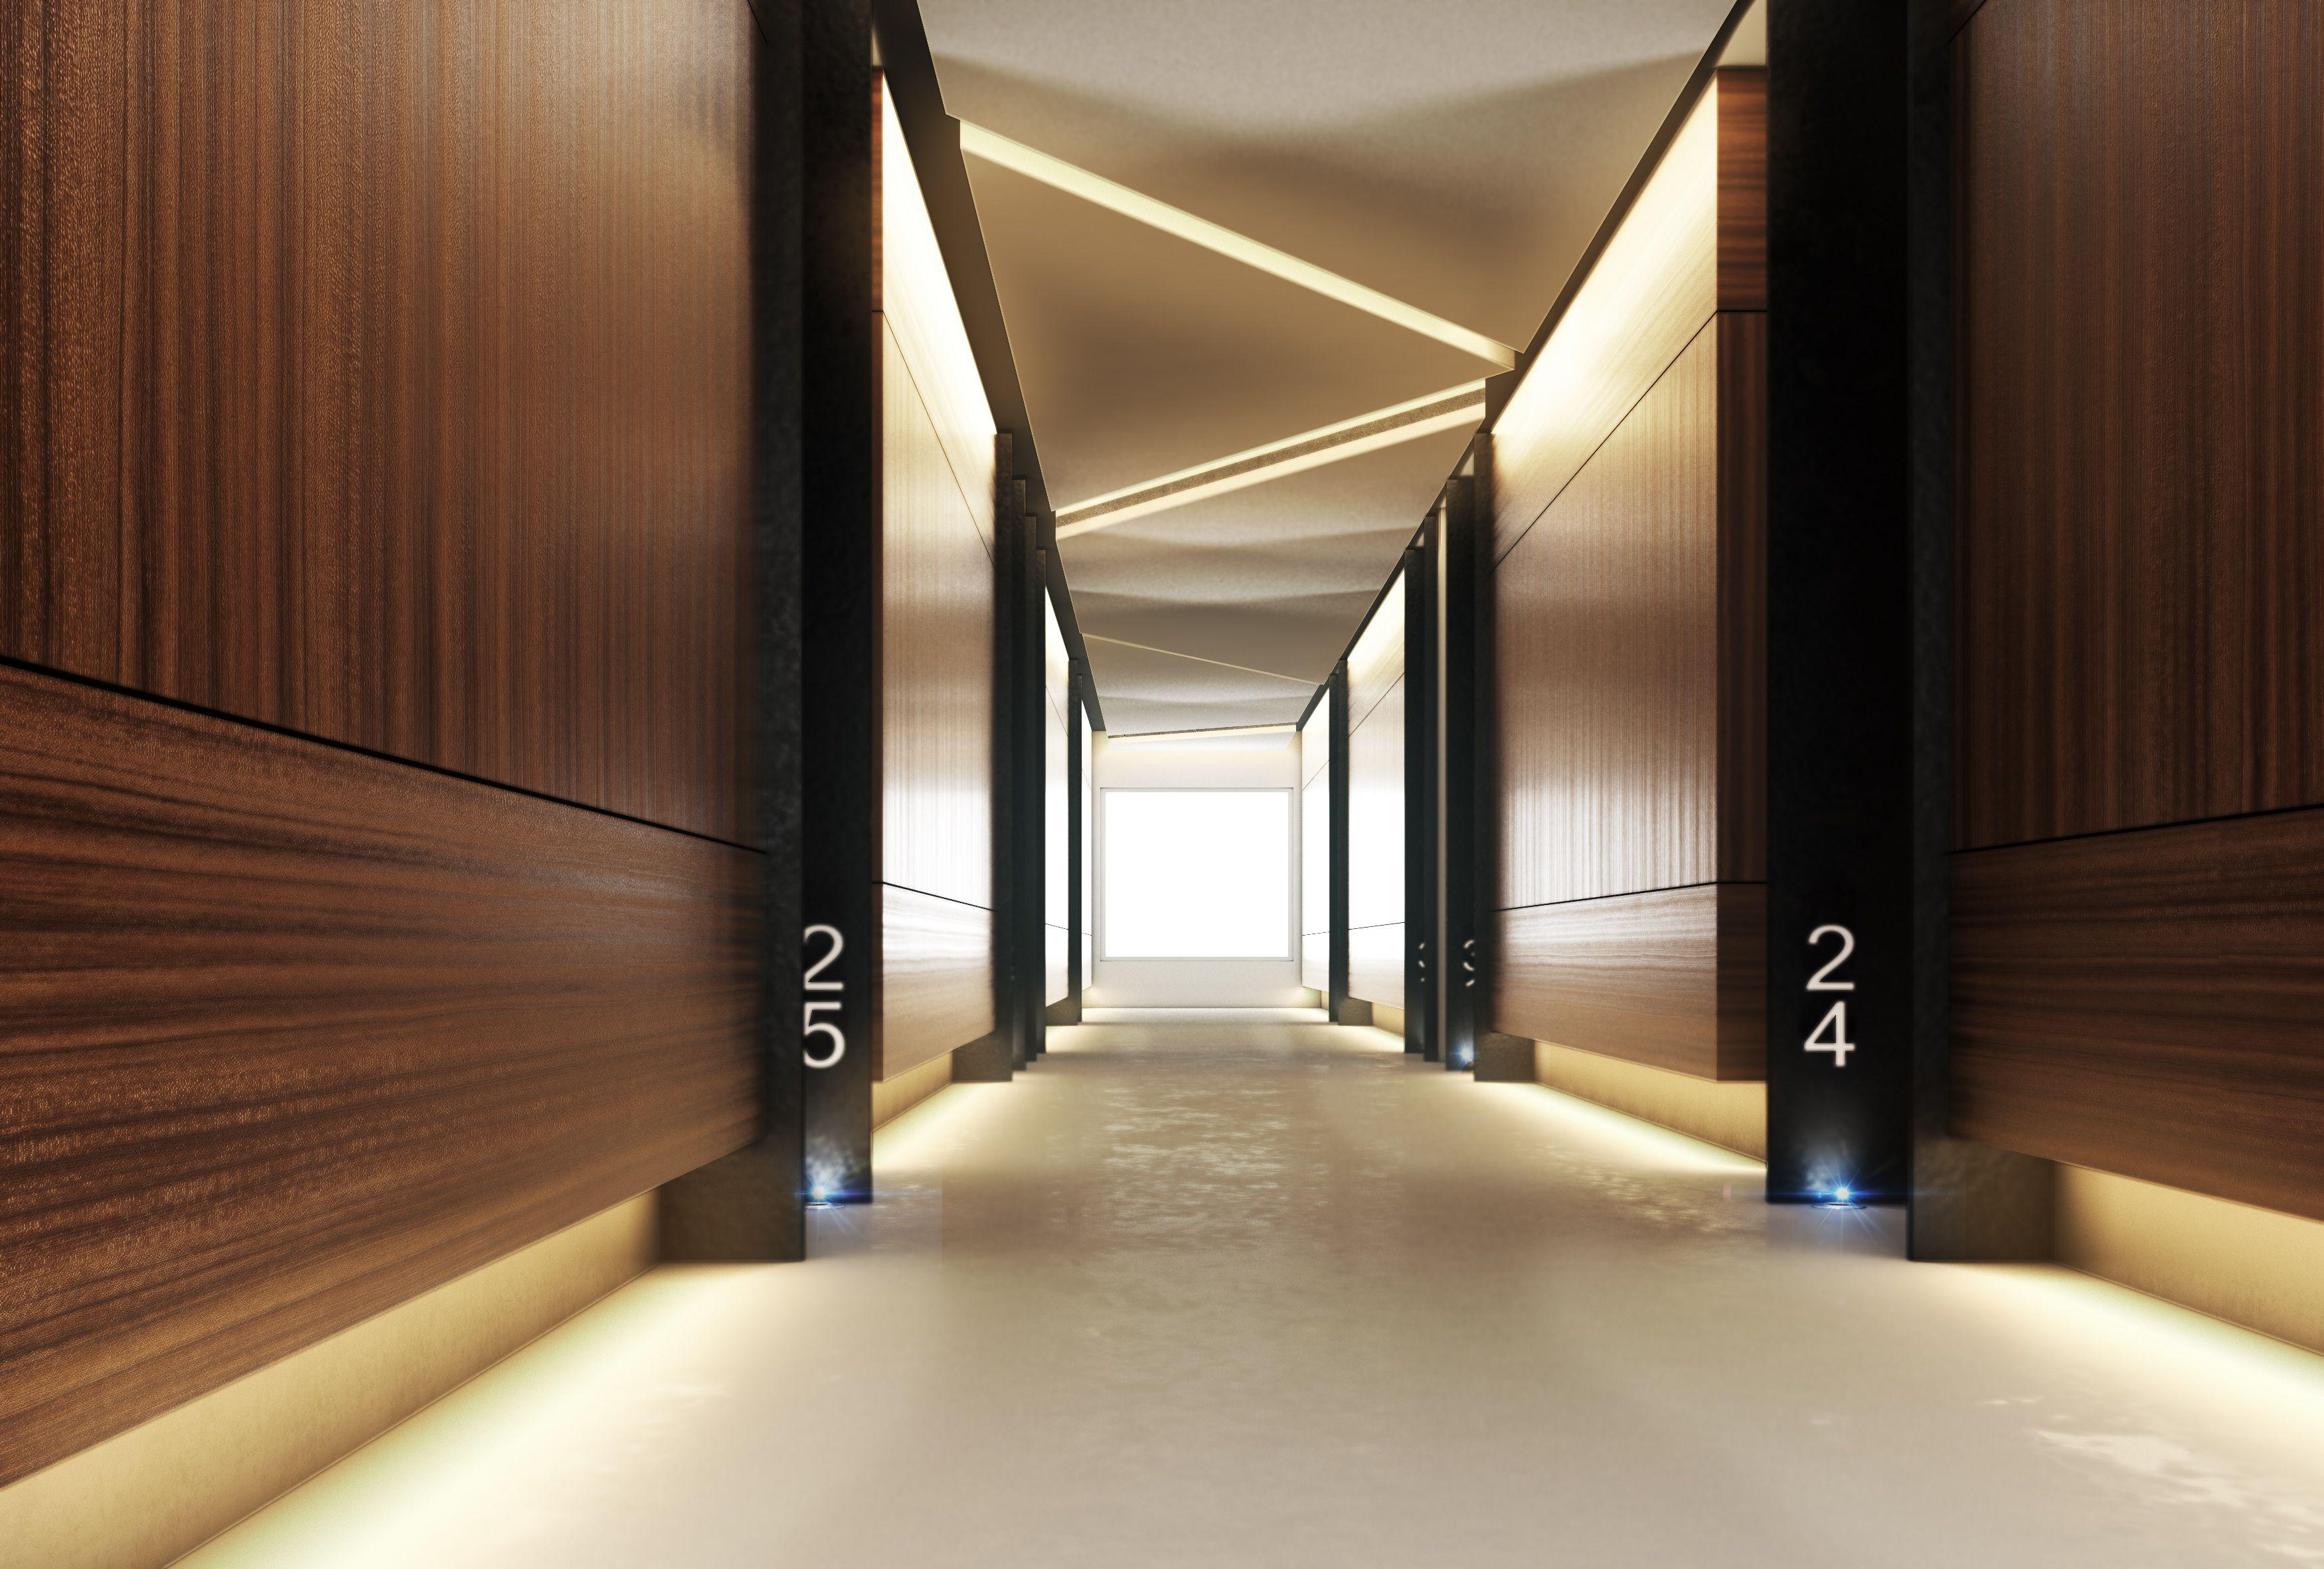 72 Hotel Ideas Hotel Hotel Design Hotels Design